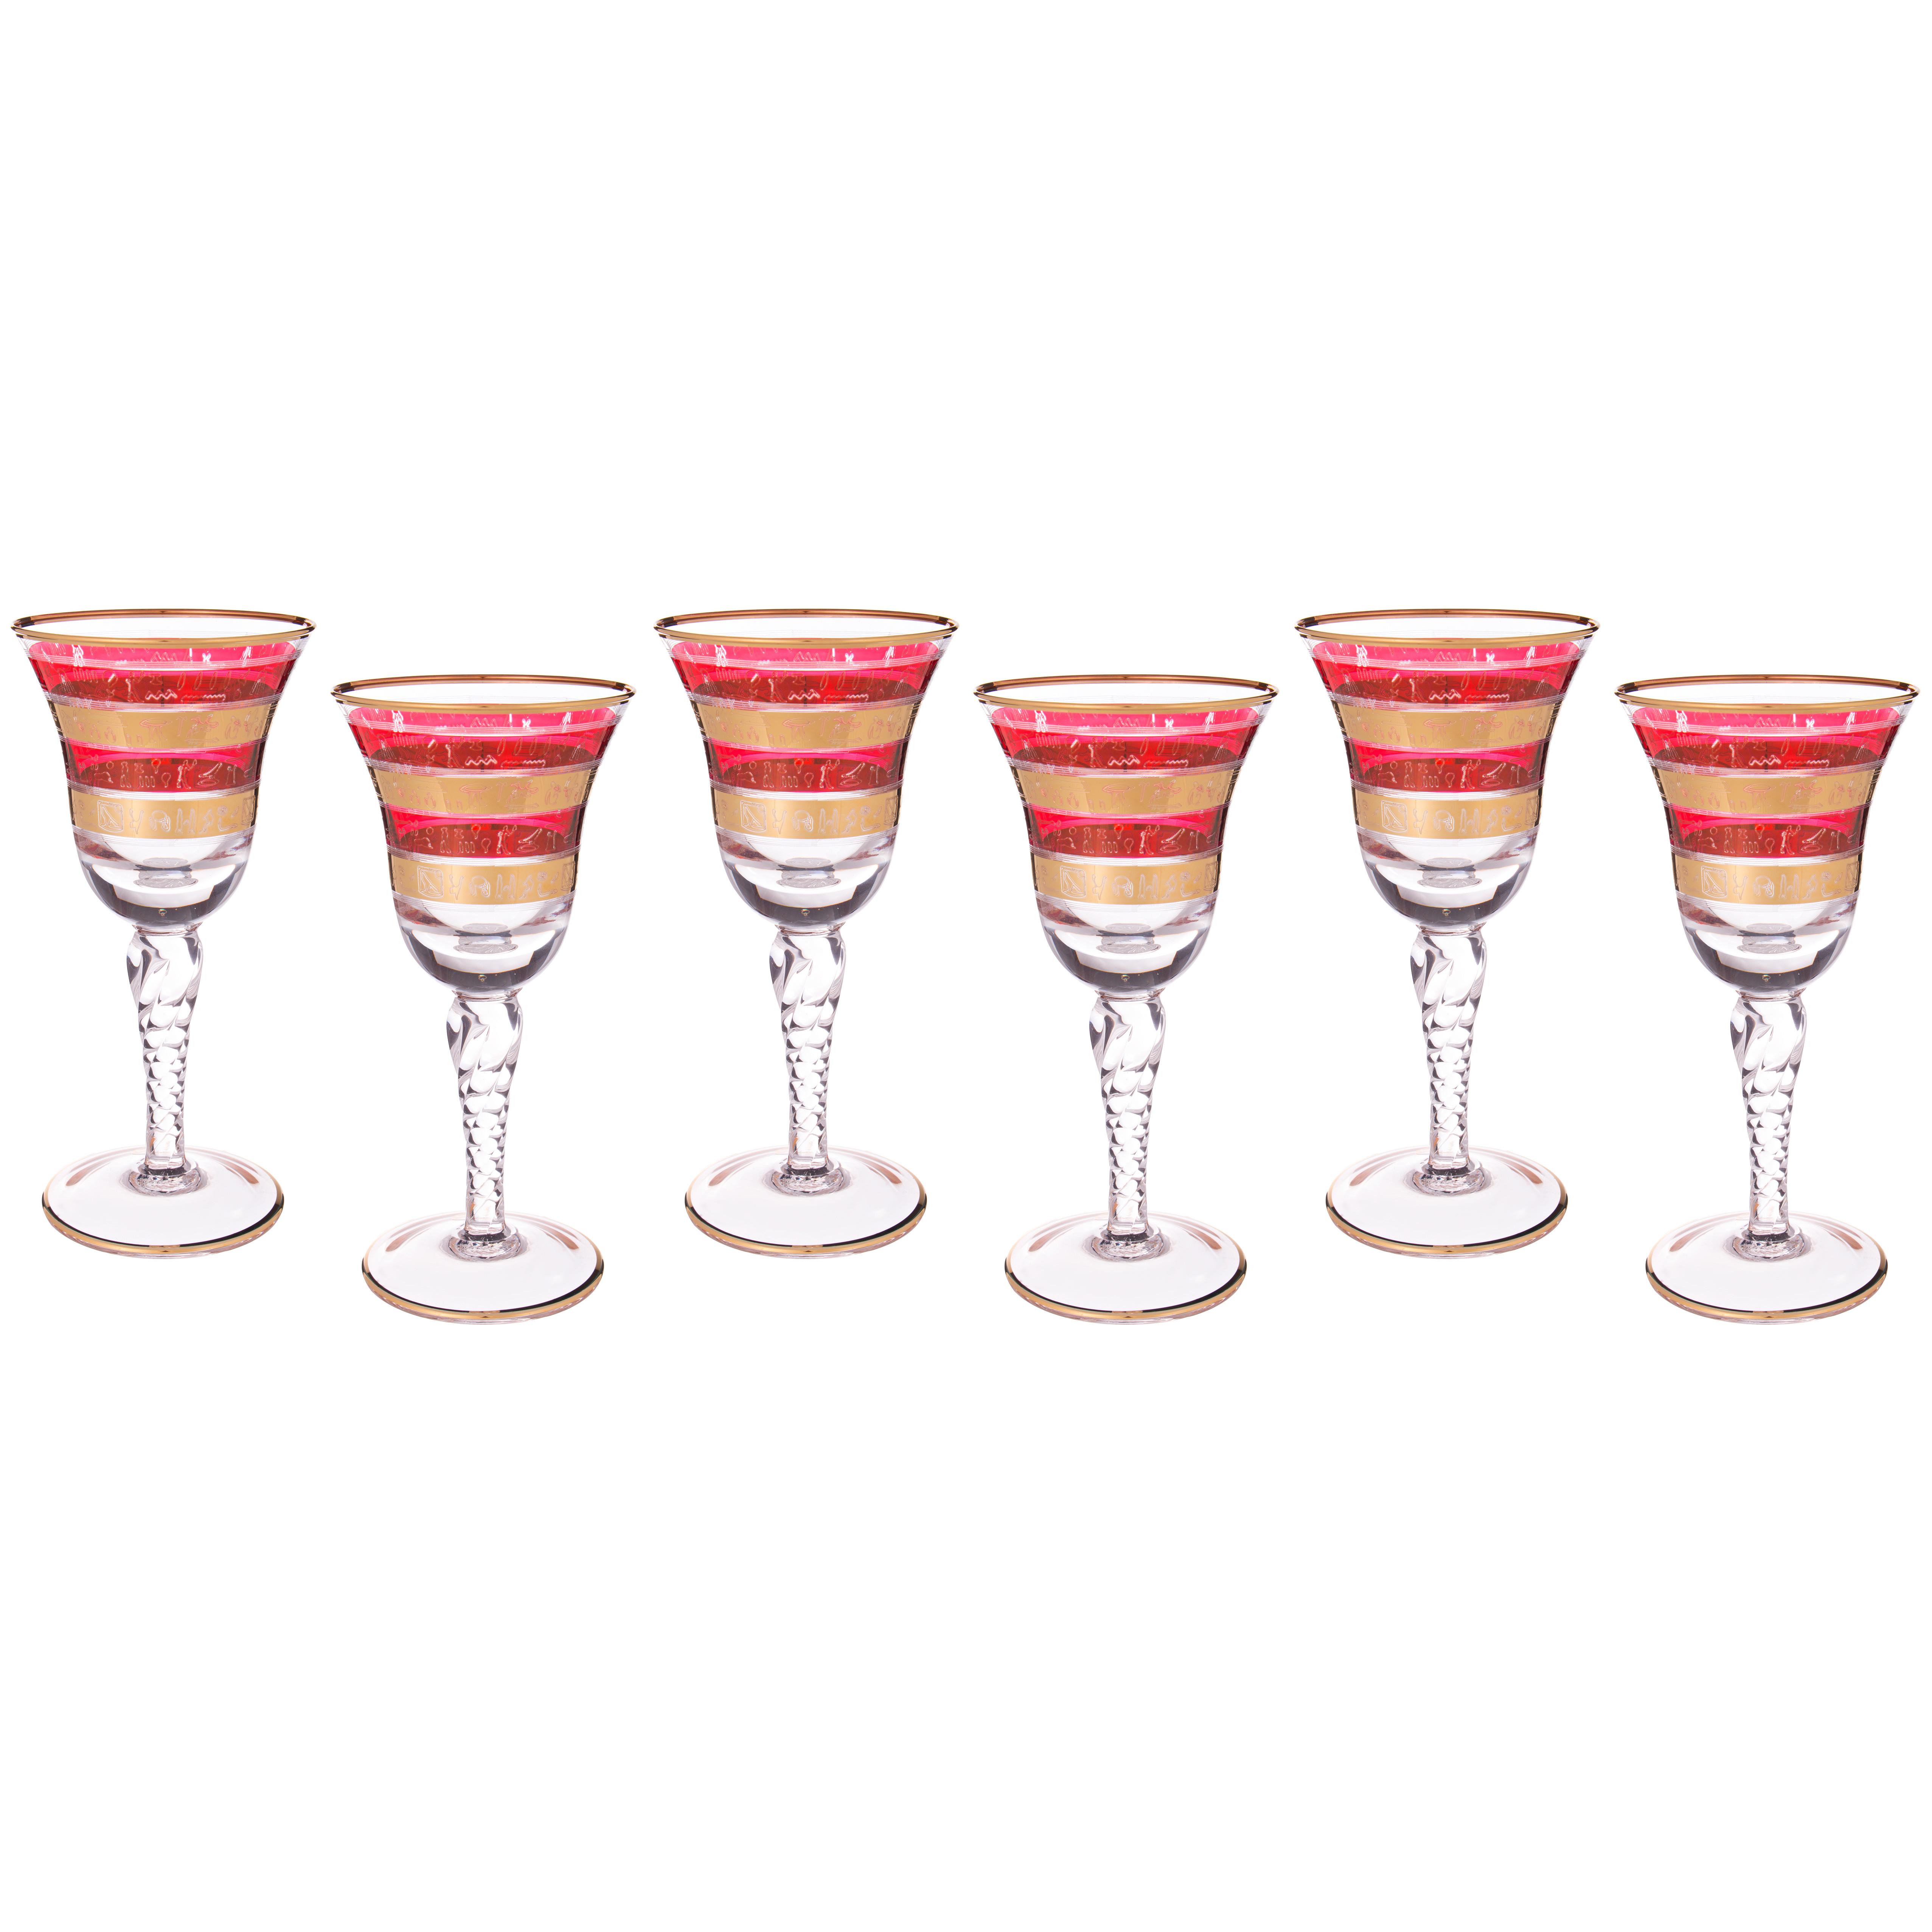 {} Same Набор бокалов для вина Vonnie (250 мл - 6 шт) sistema набор бокалов для бренди brandy 840 мл 2 шт